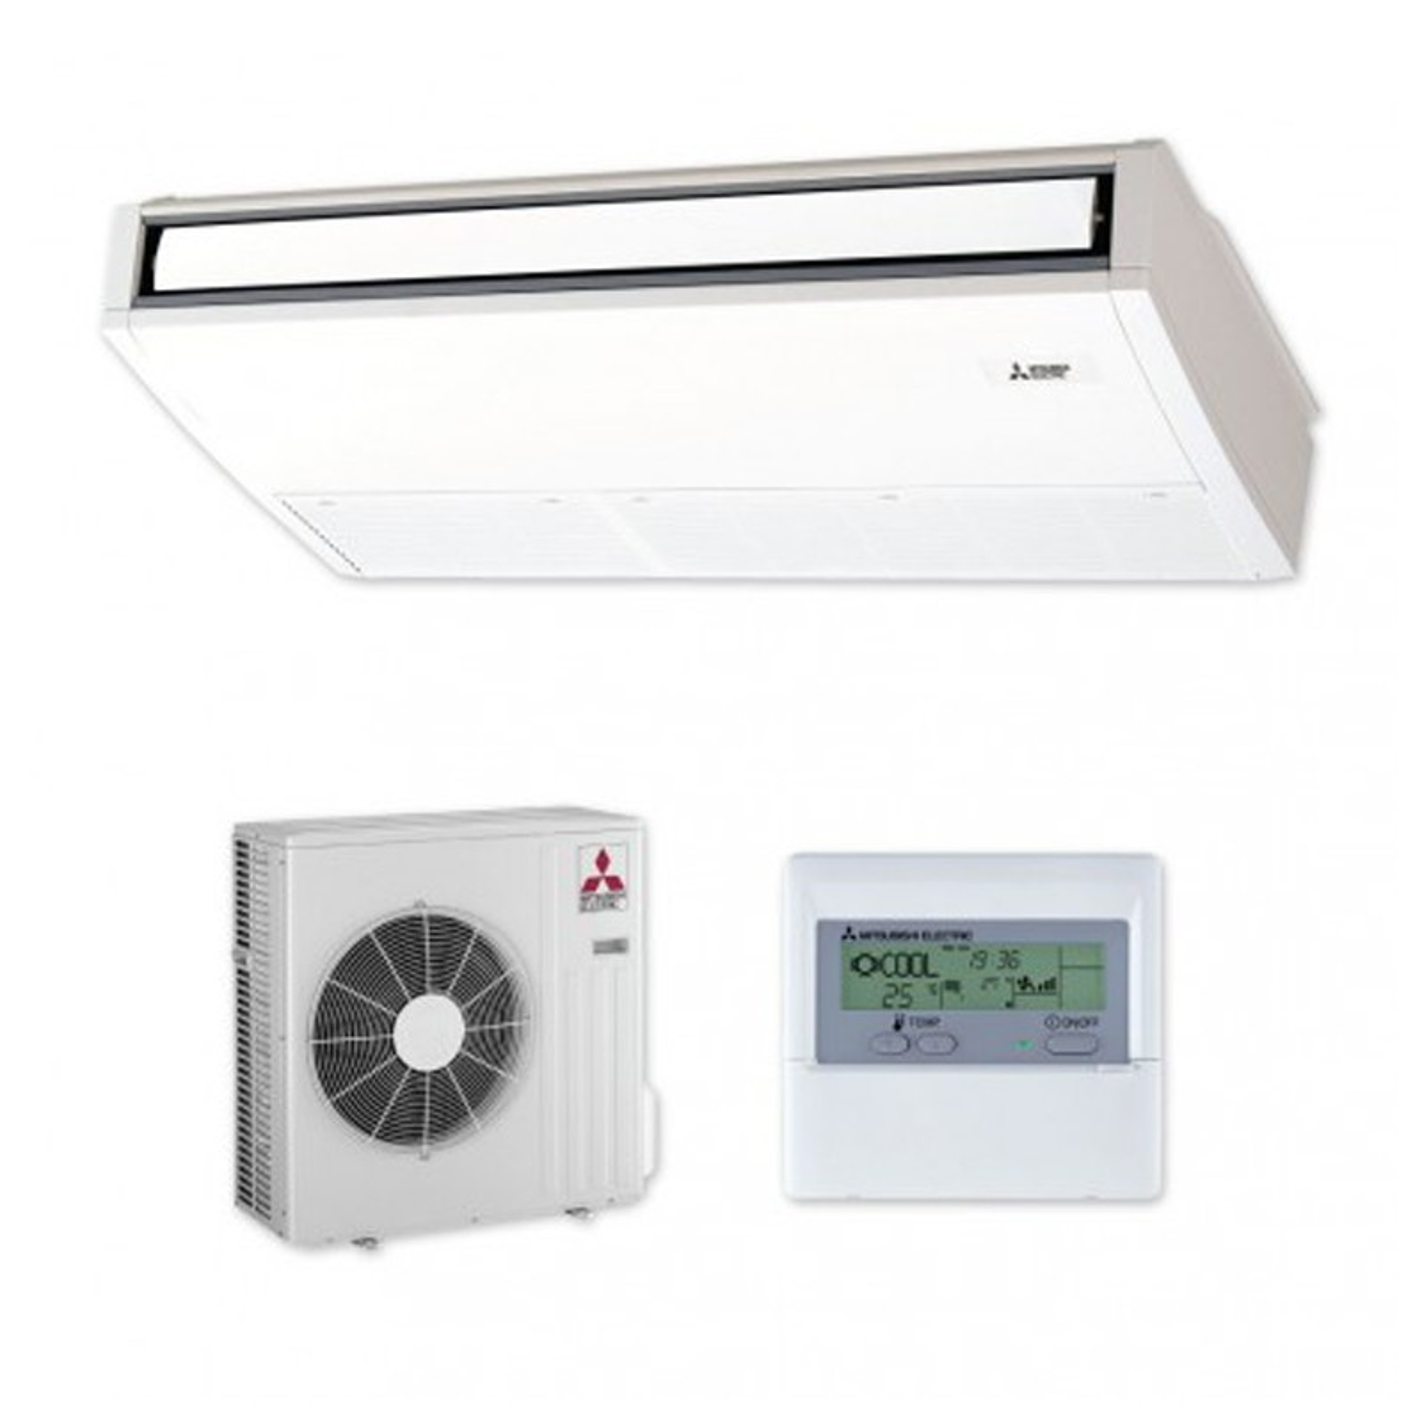 Aire acondicionado techo mitsubishi spczs 71vka precio for Comparativa aire acondicionado daikin mitsubishi